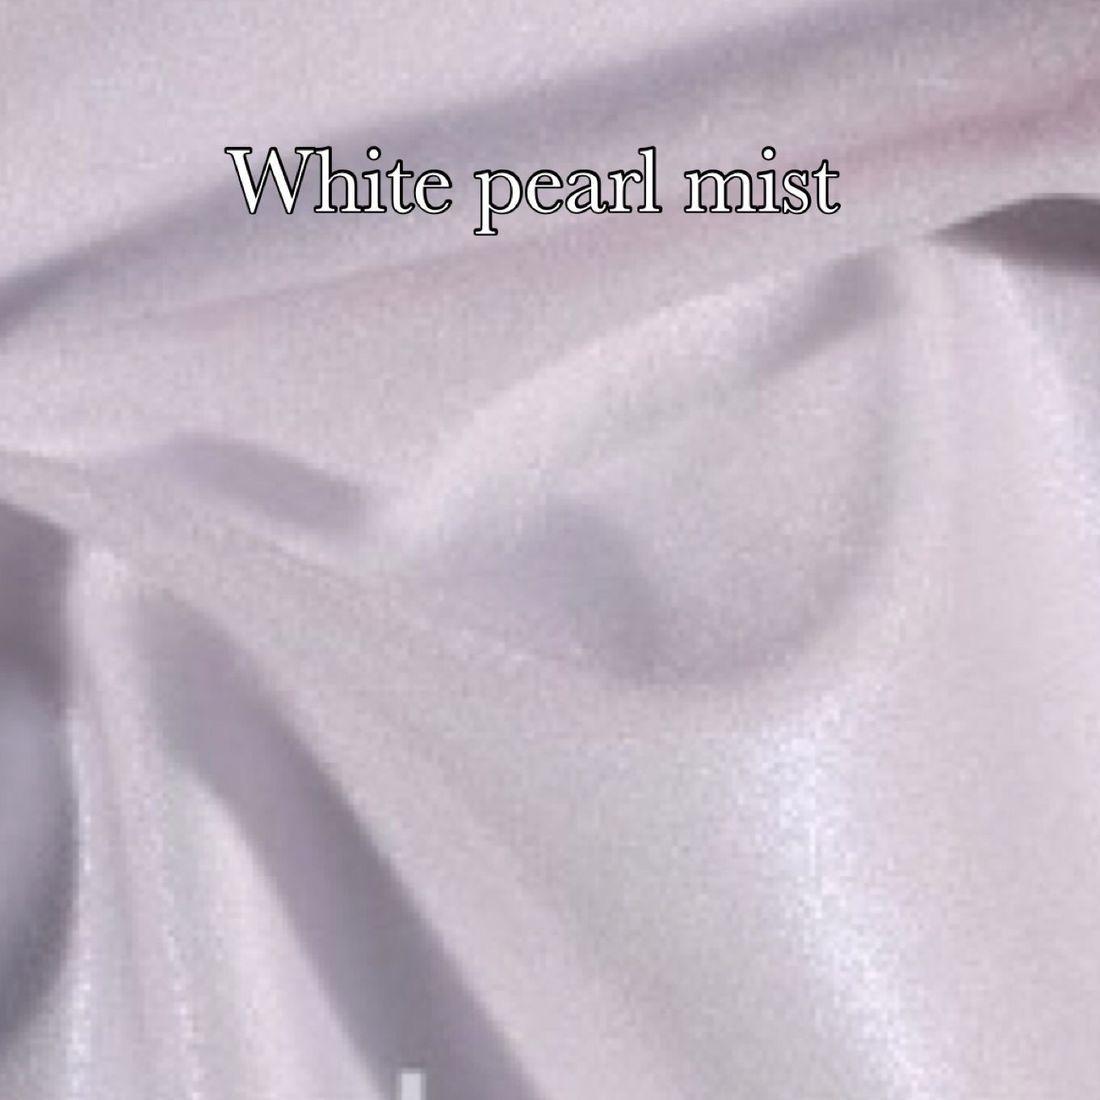 White pearl mist